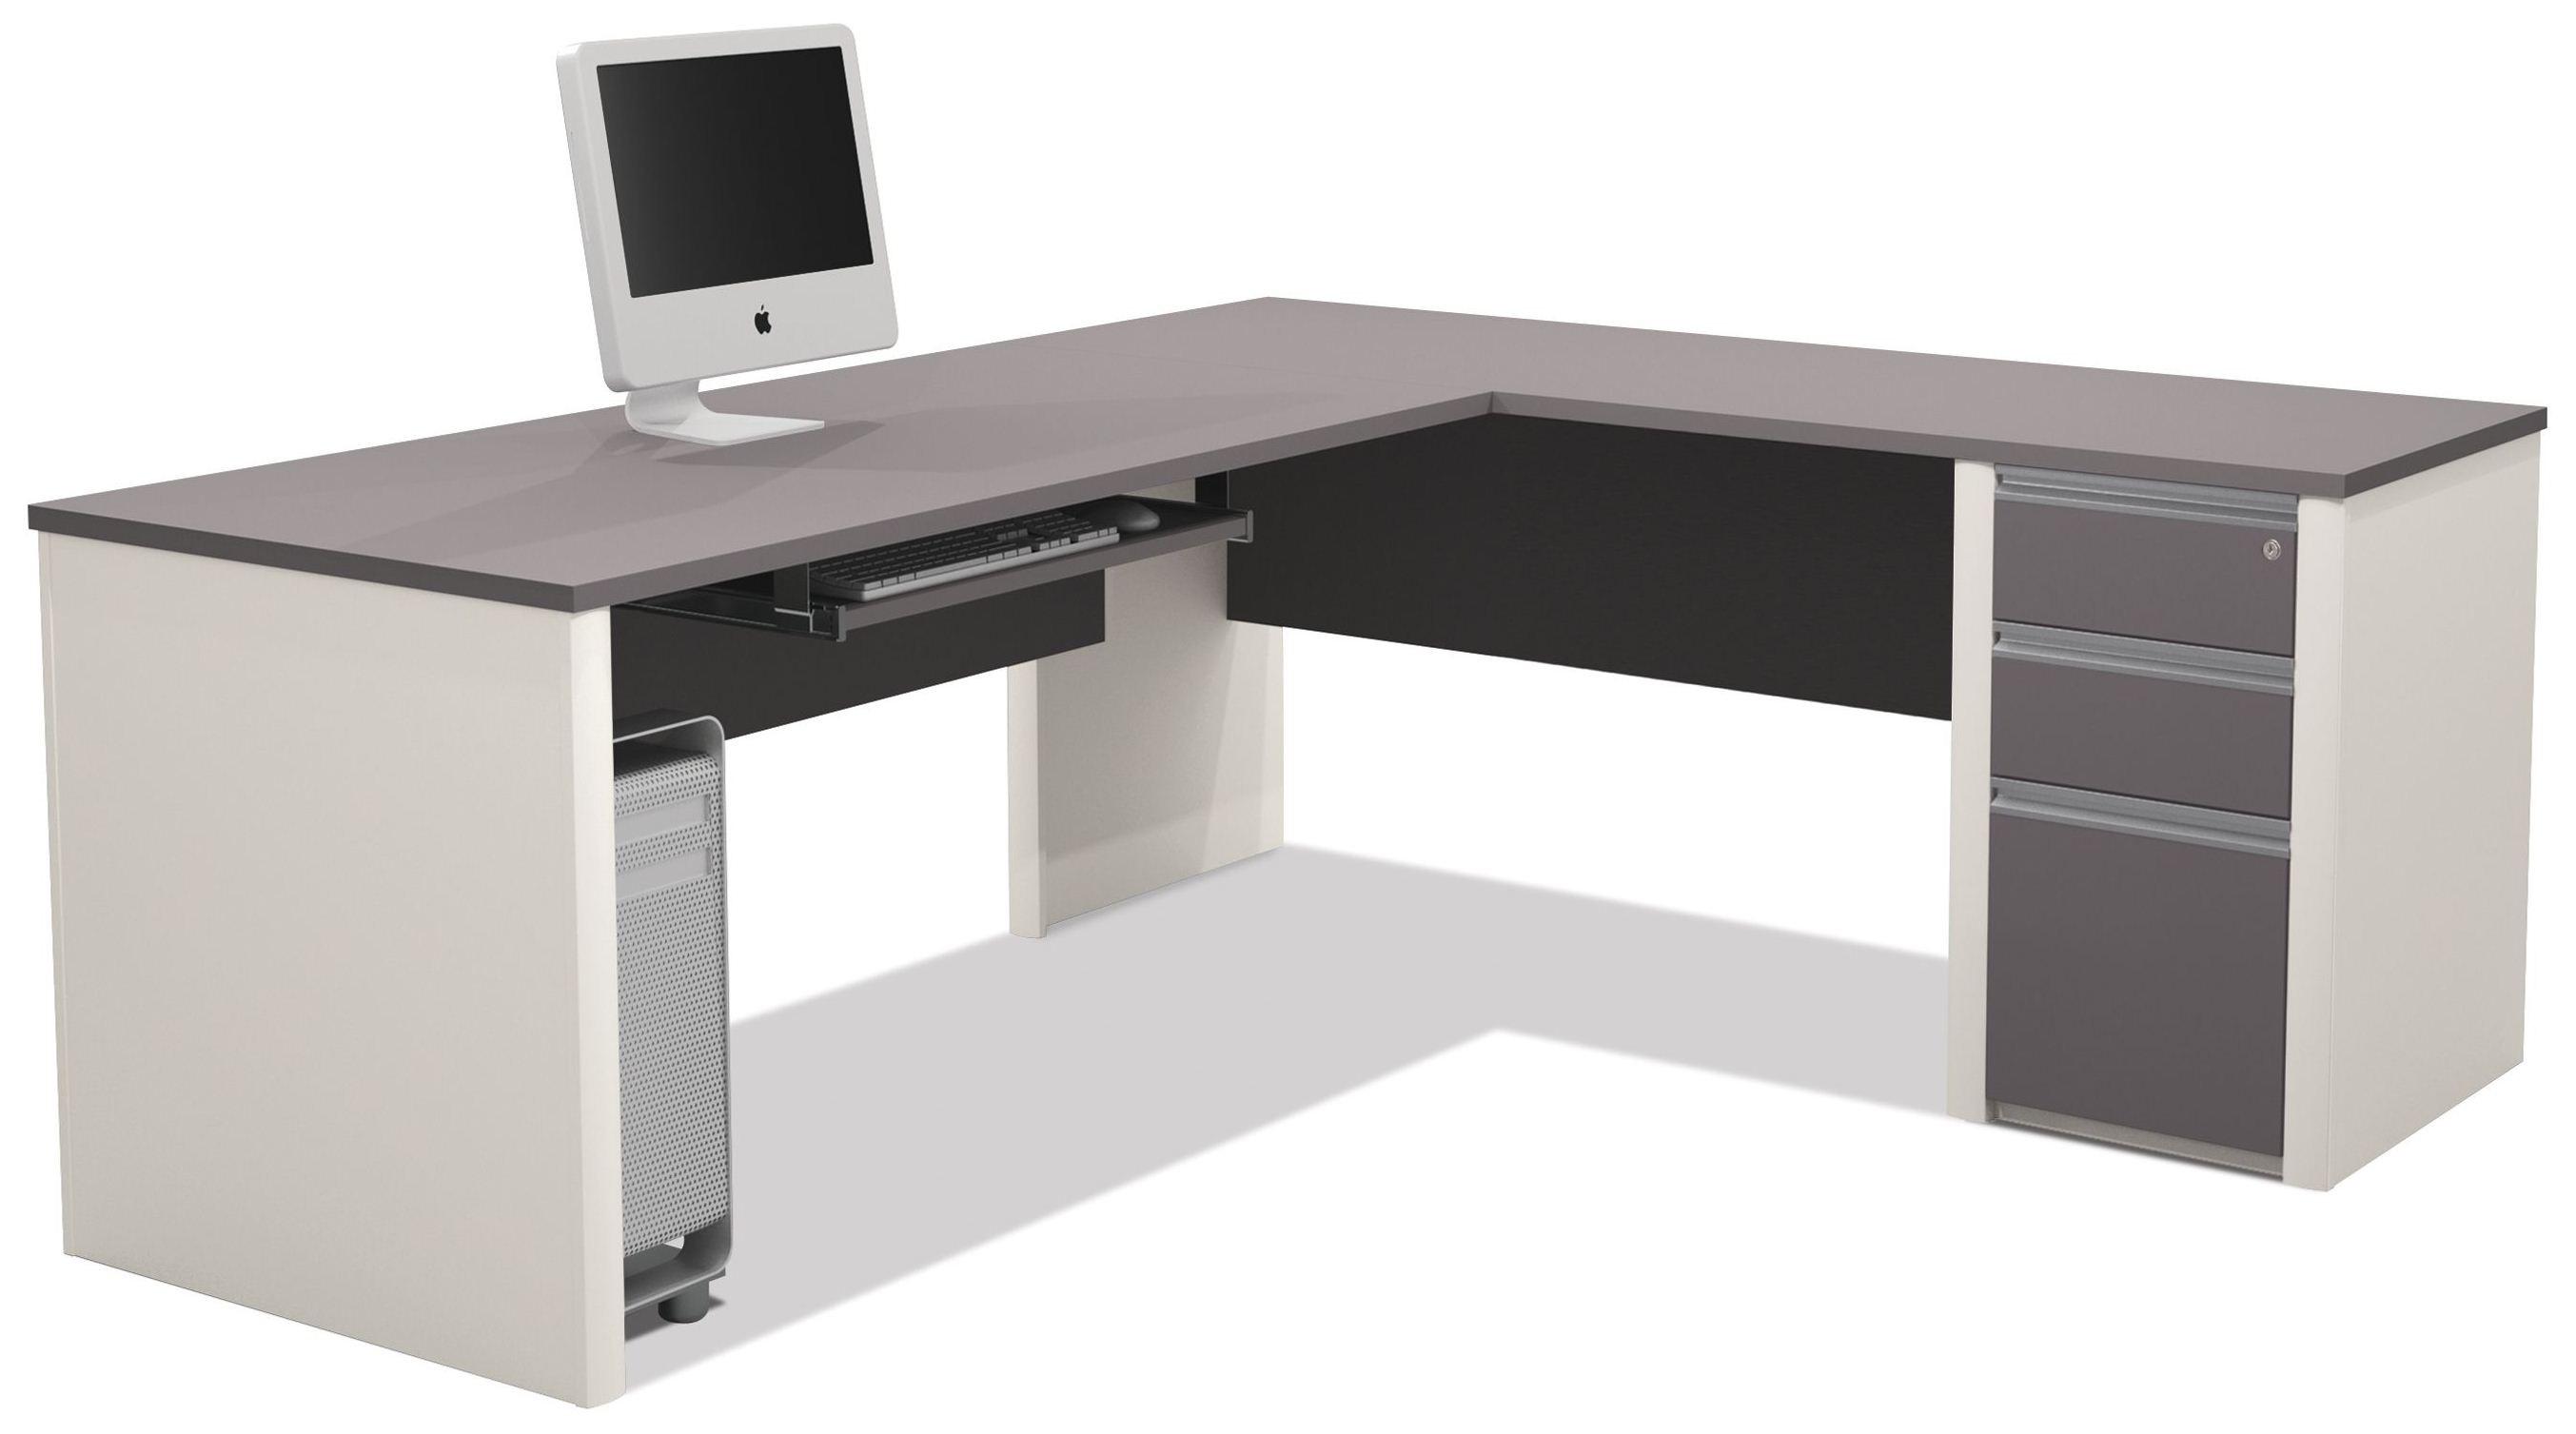 Connexion Slate Amp Sandstone L Shaped Desk From Bestar